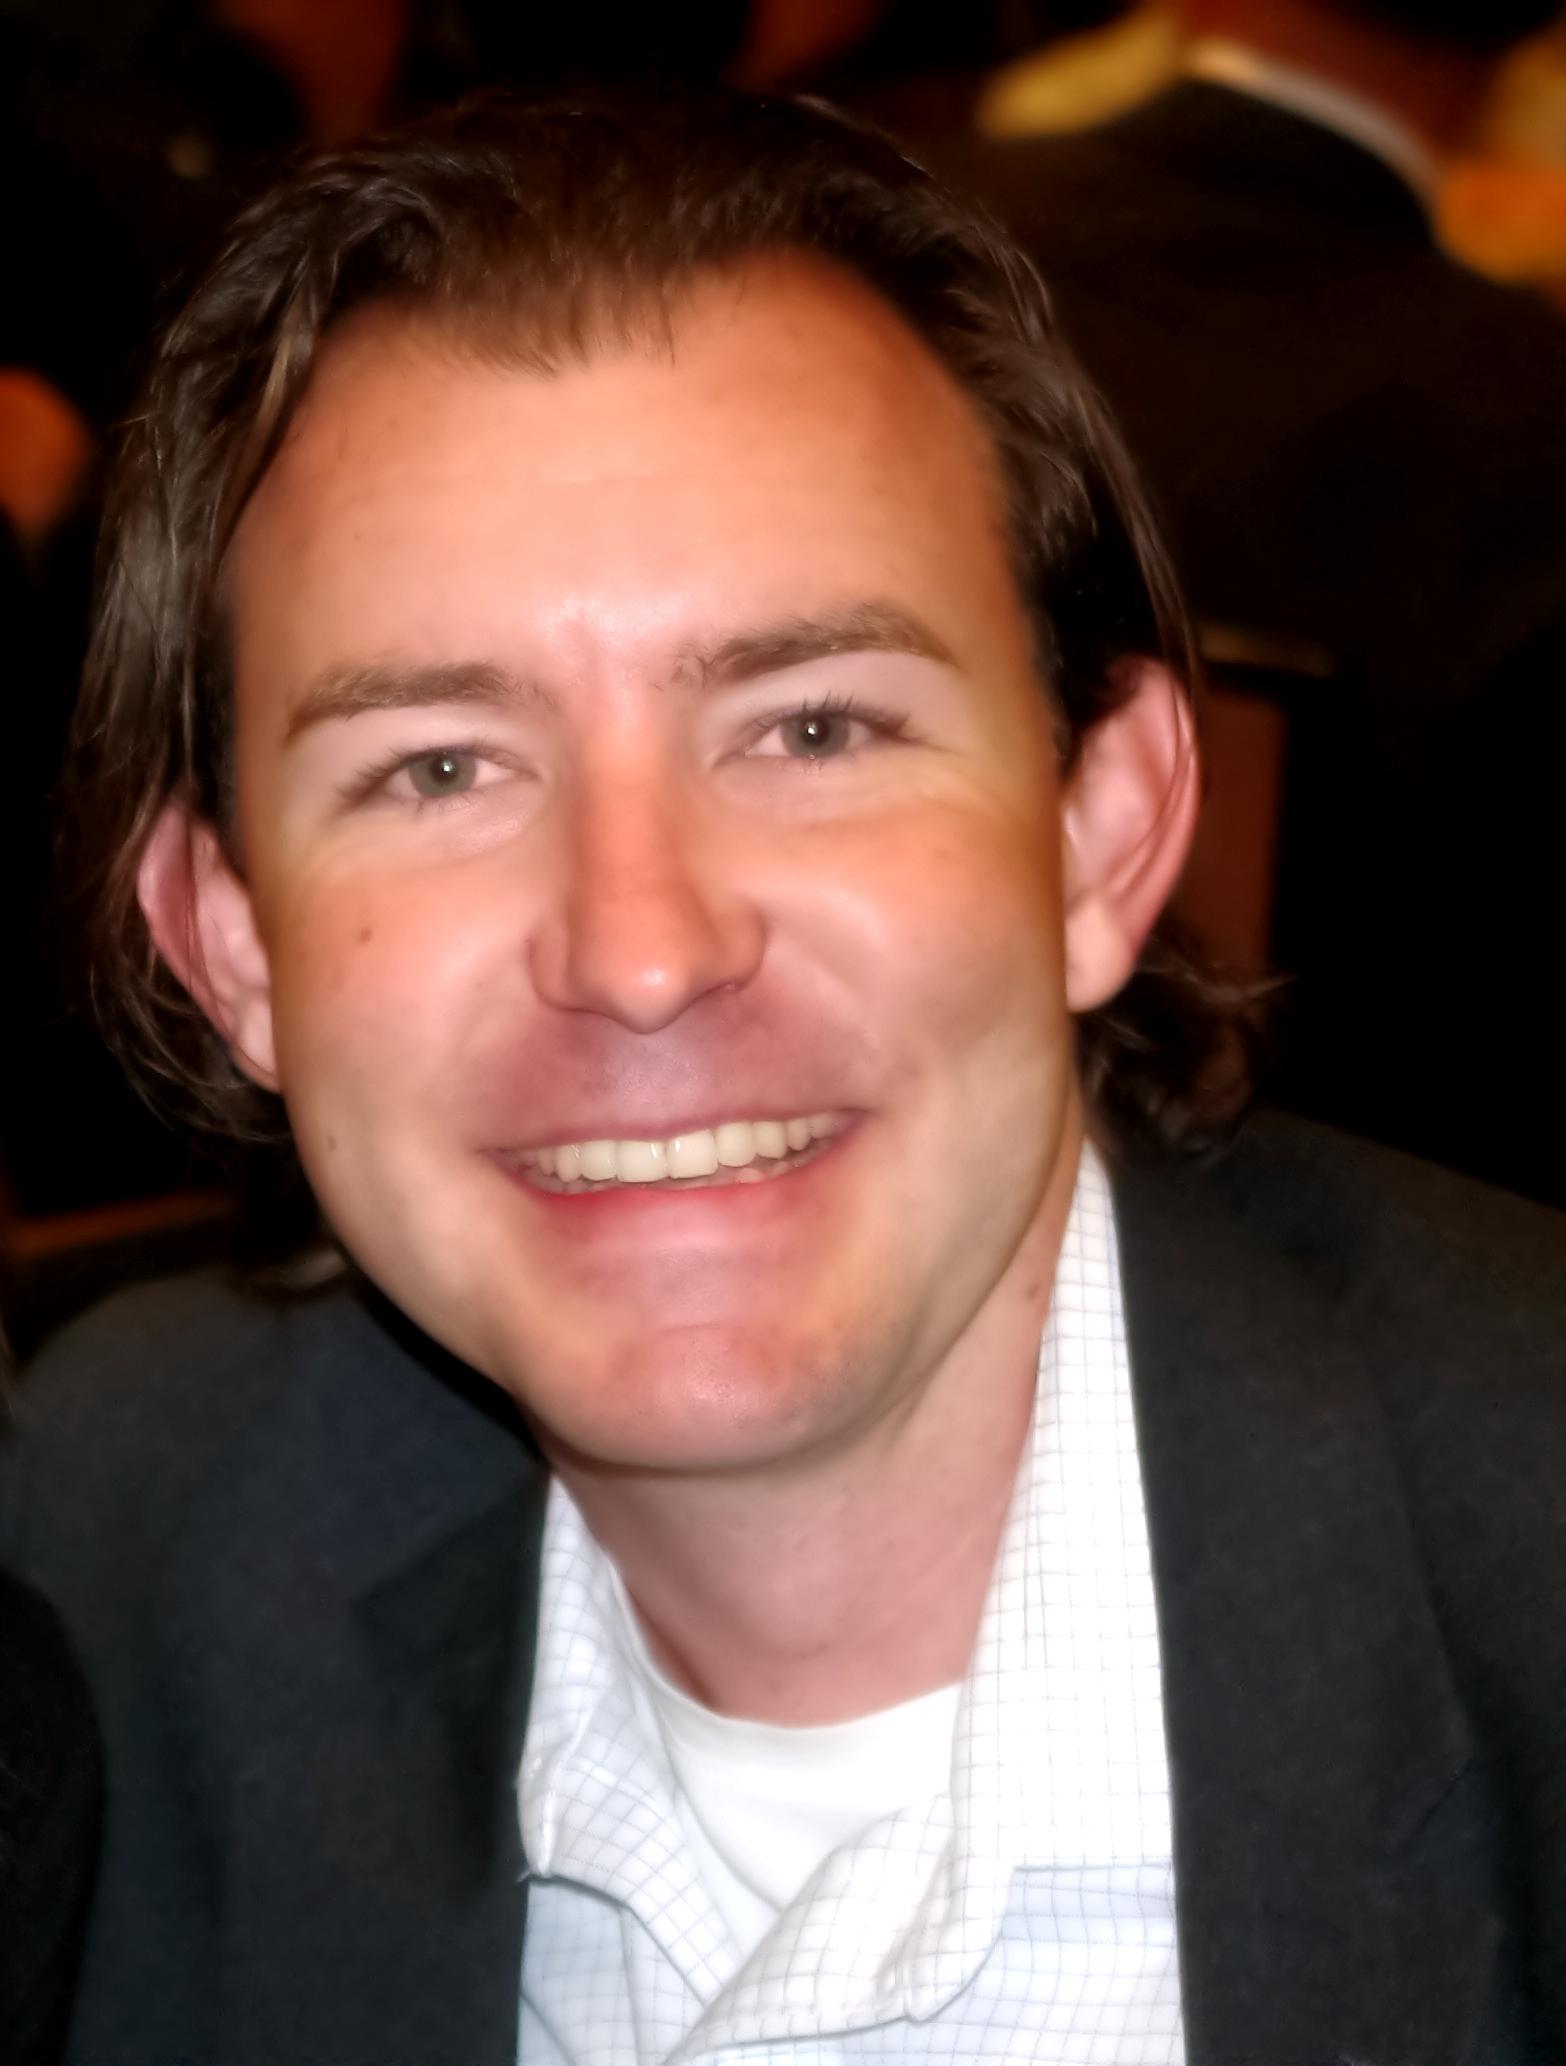 Damien O'Farrell